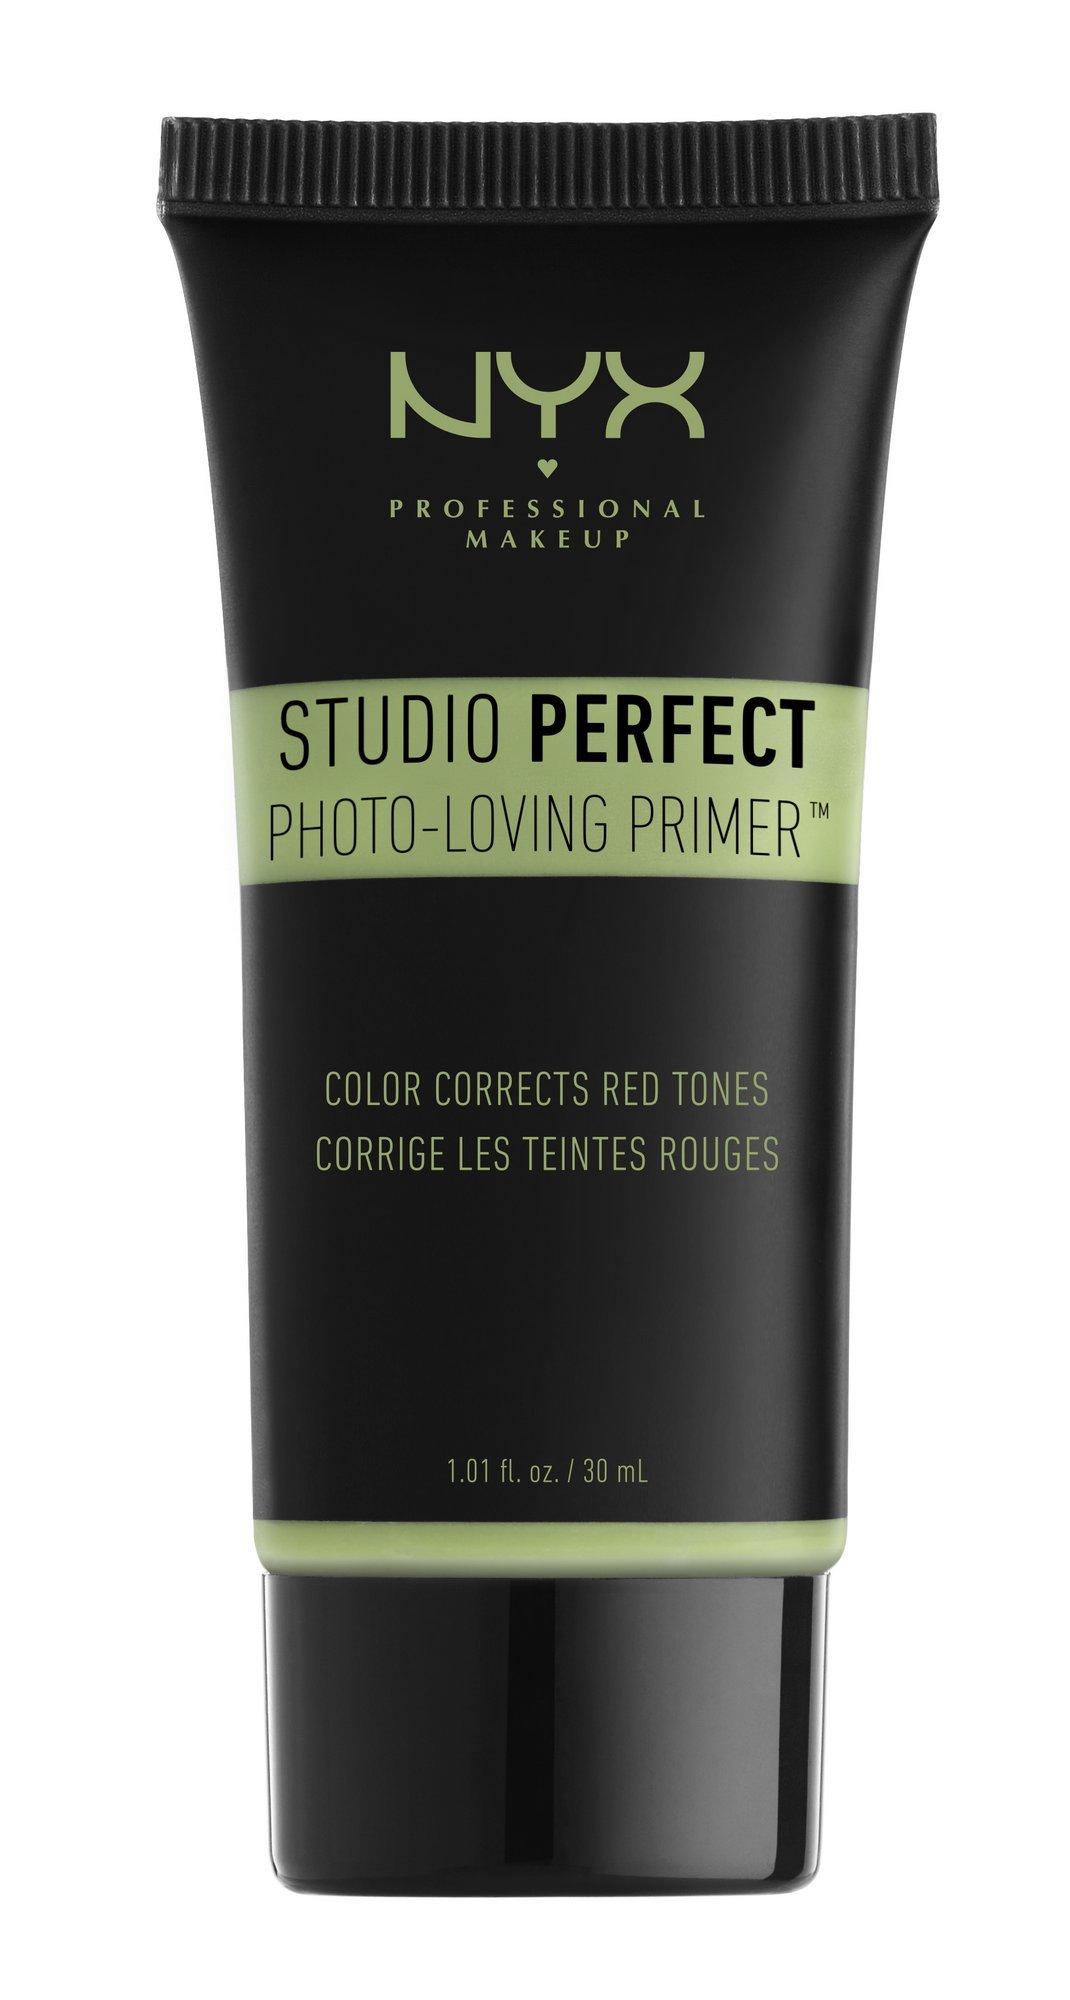 NYX Studio Perfect Primer, Green, 1.0 oz/30ml